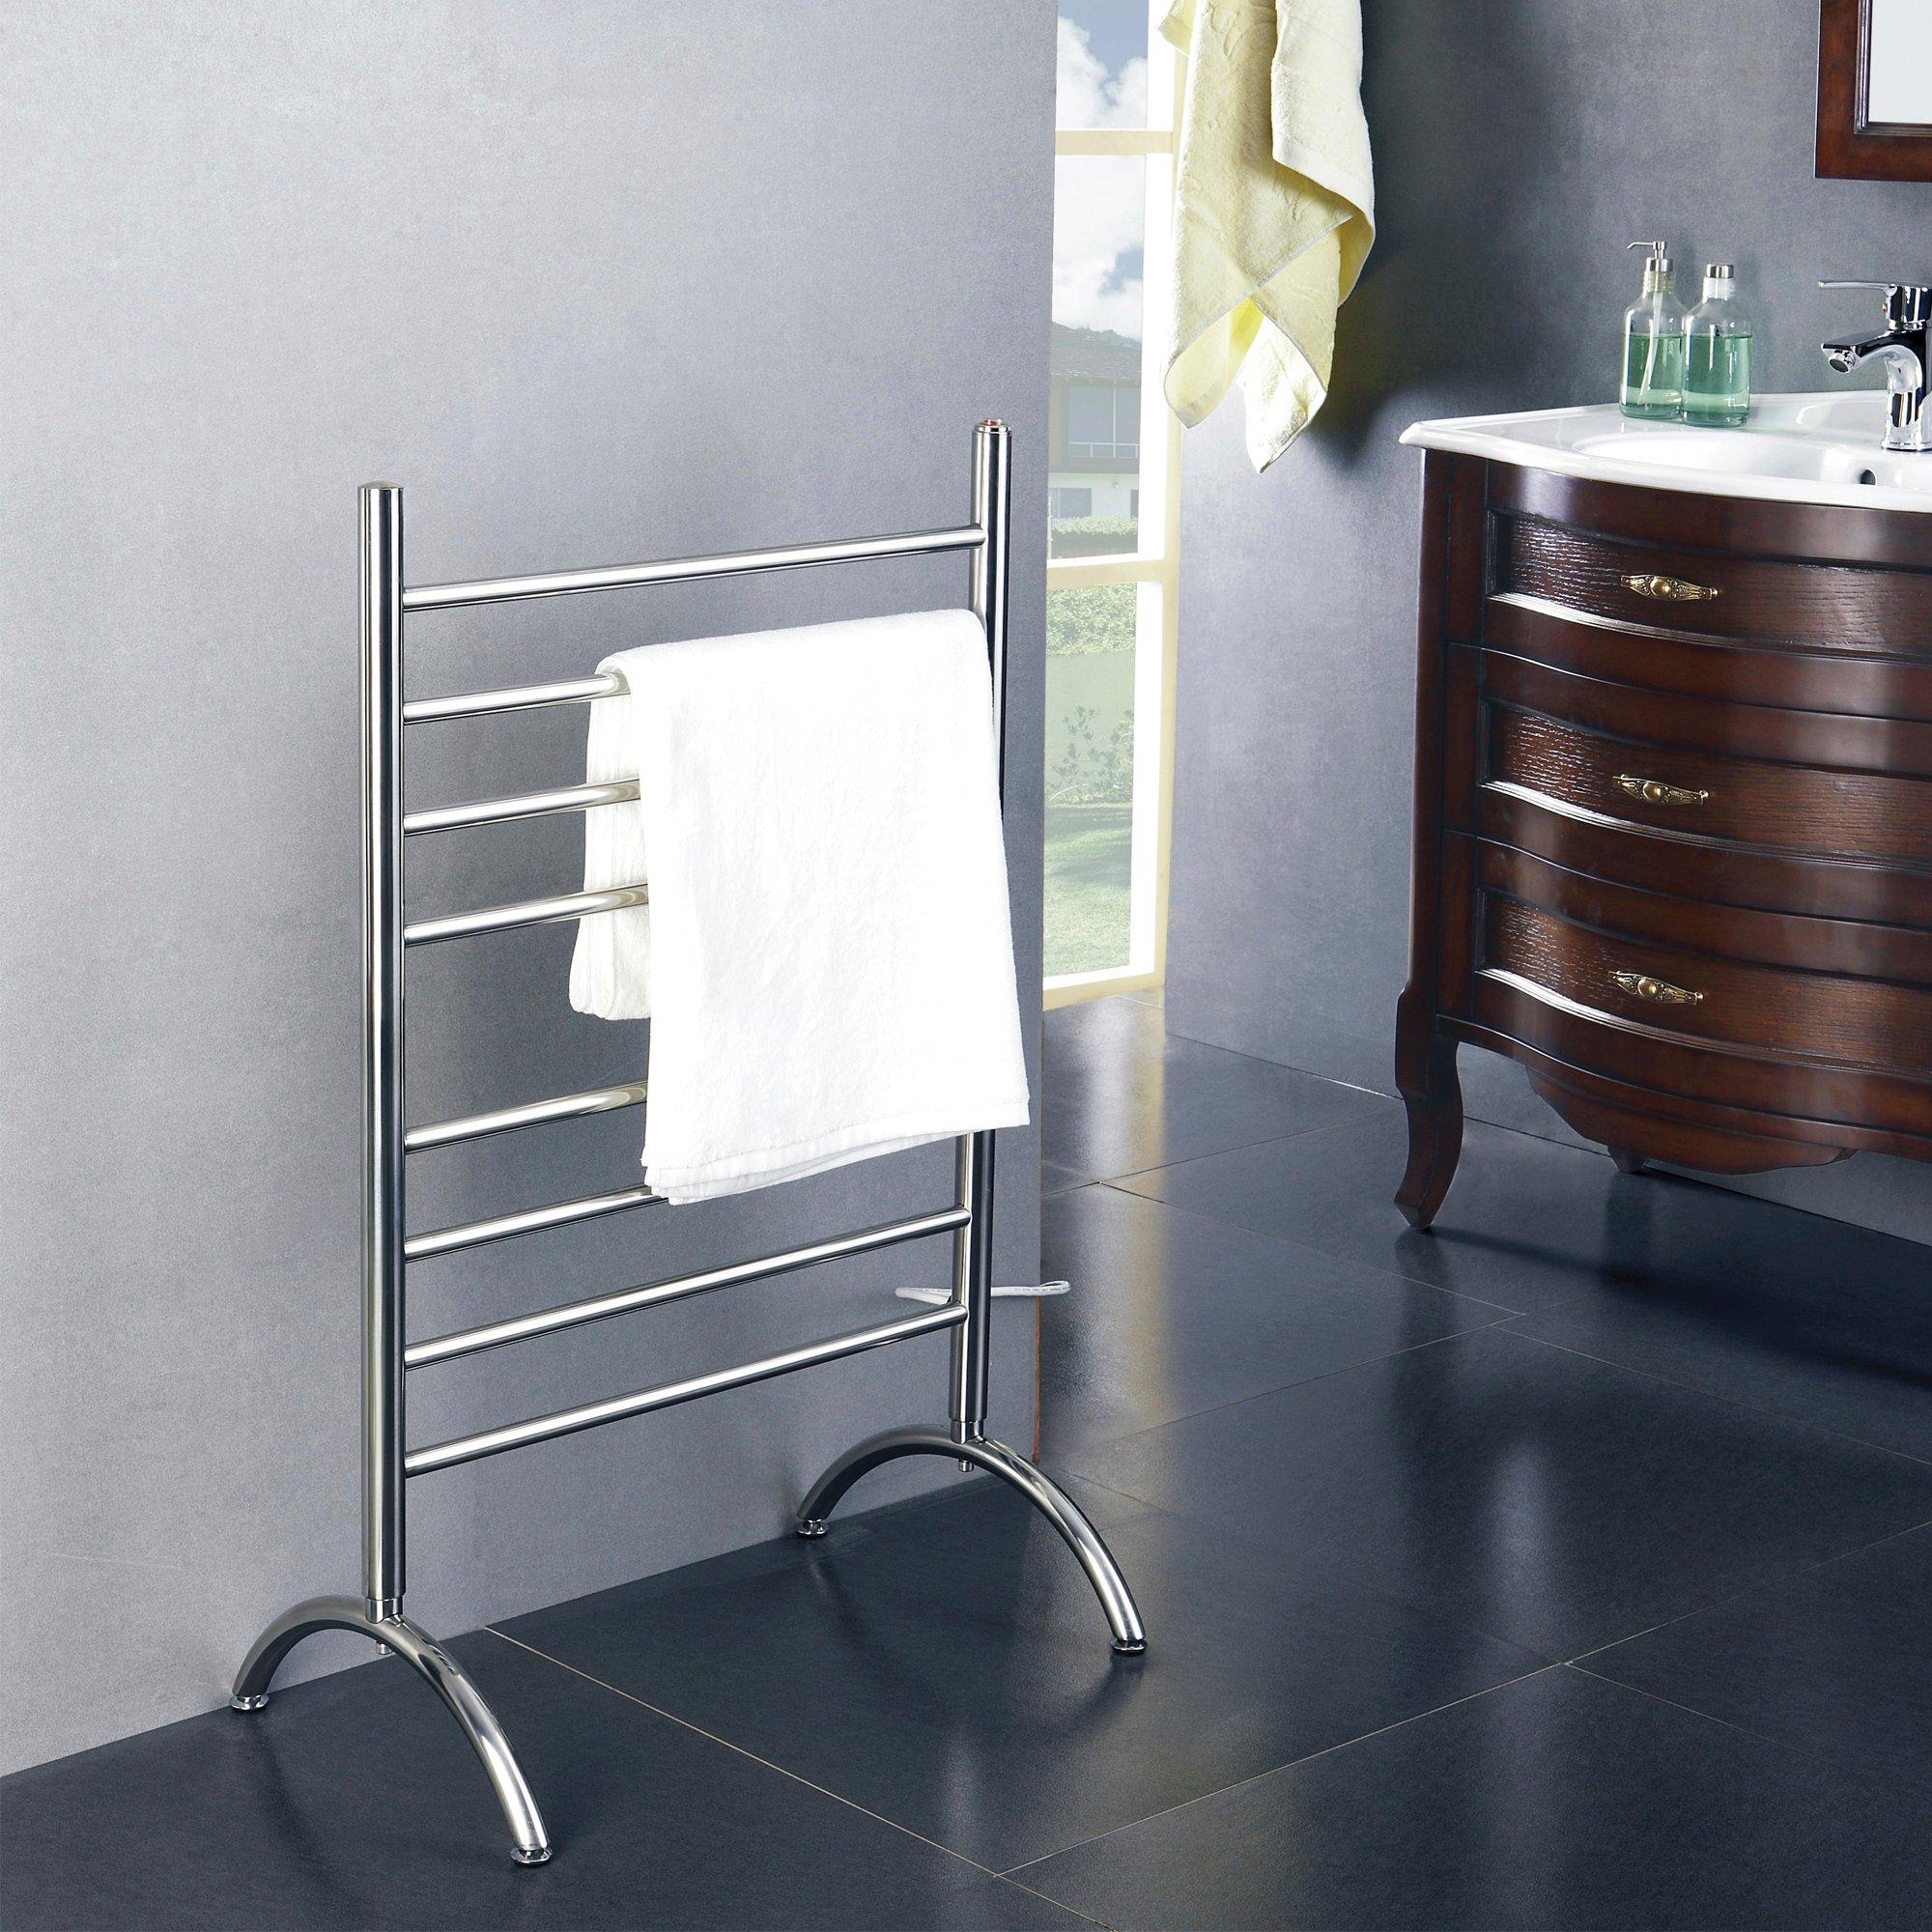 Electric Towel Warmers Heated